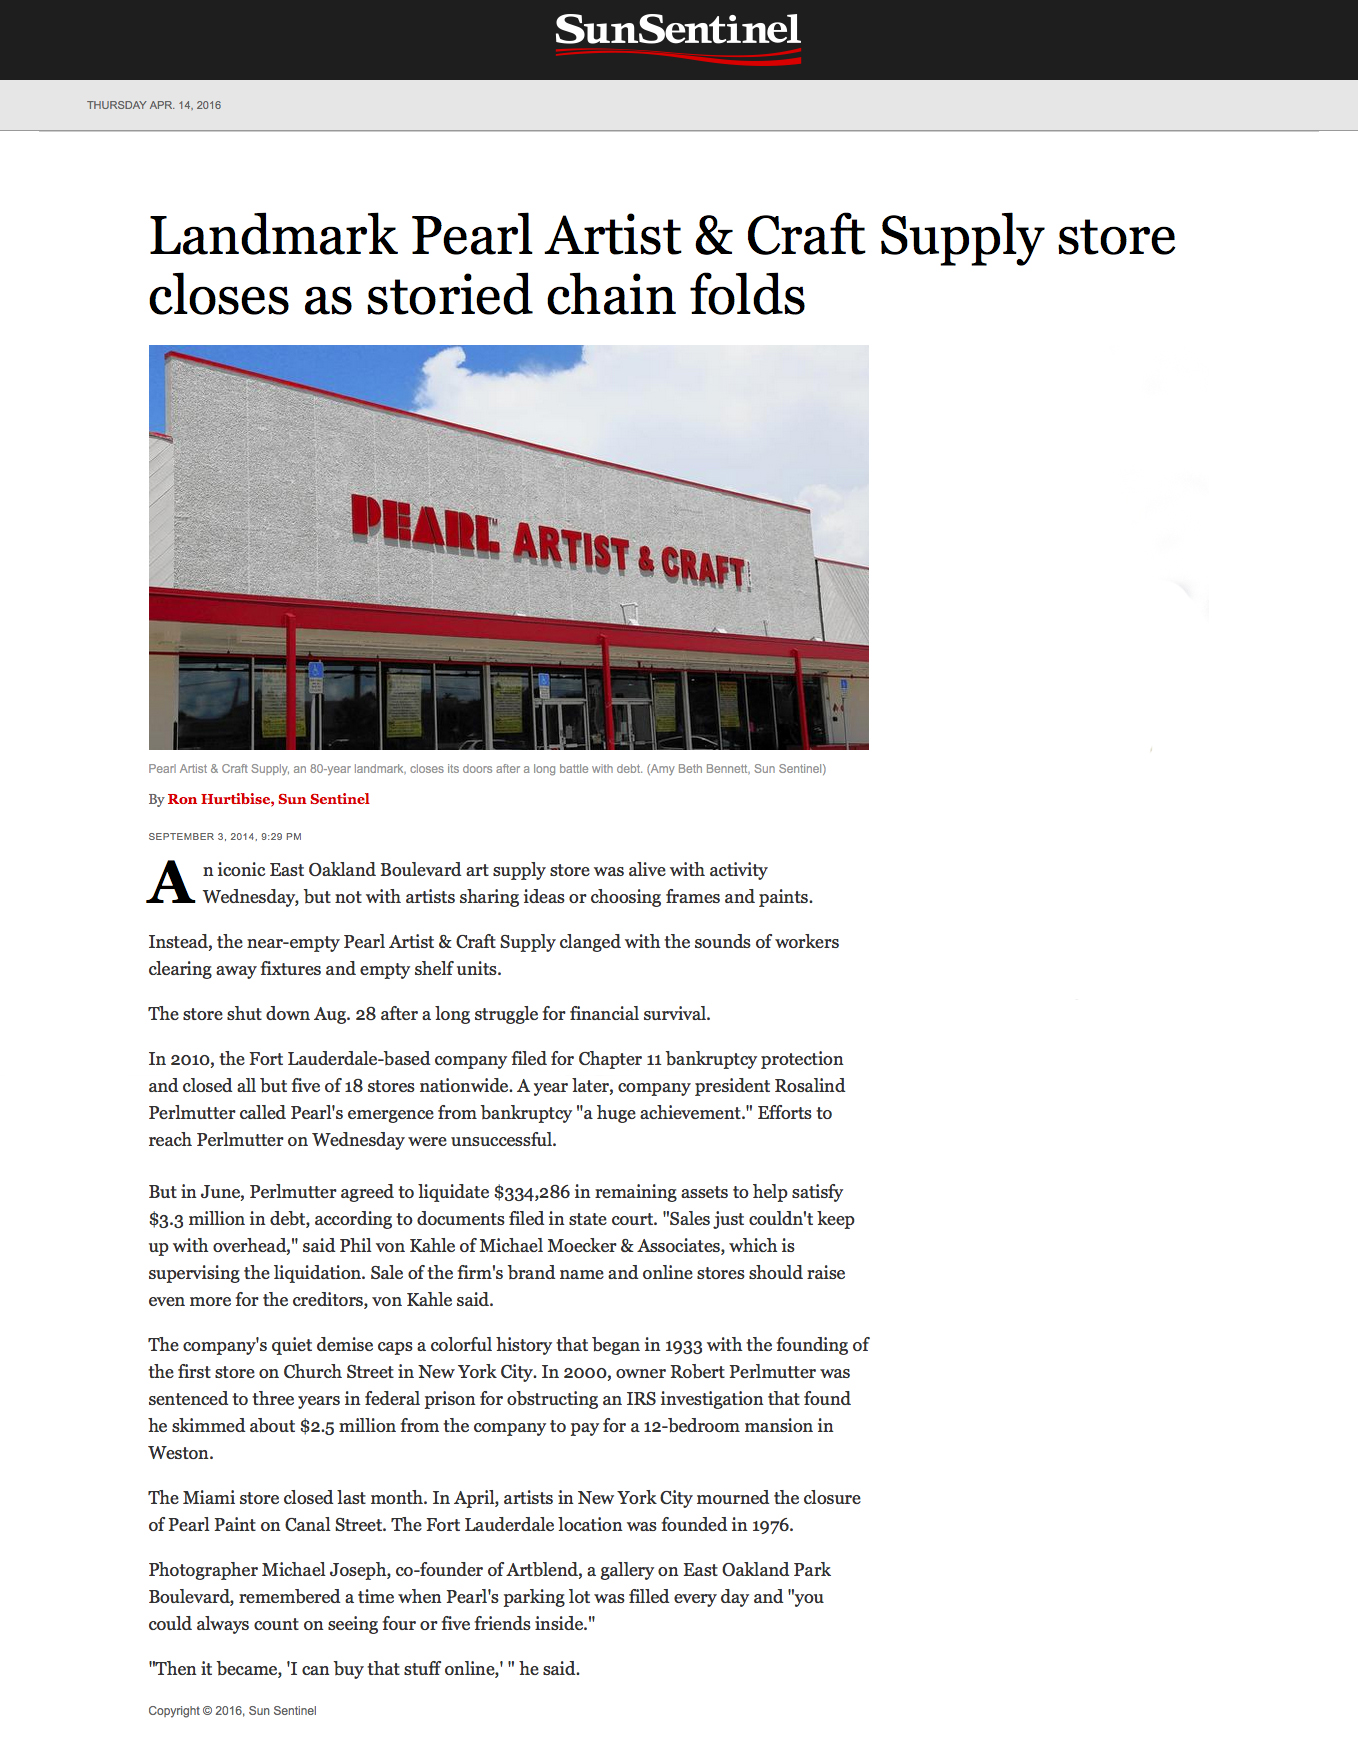 Sun Sentinal Landmark Pearl